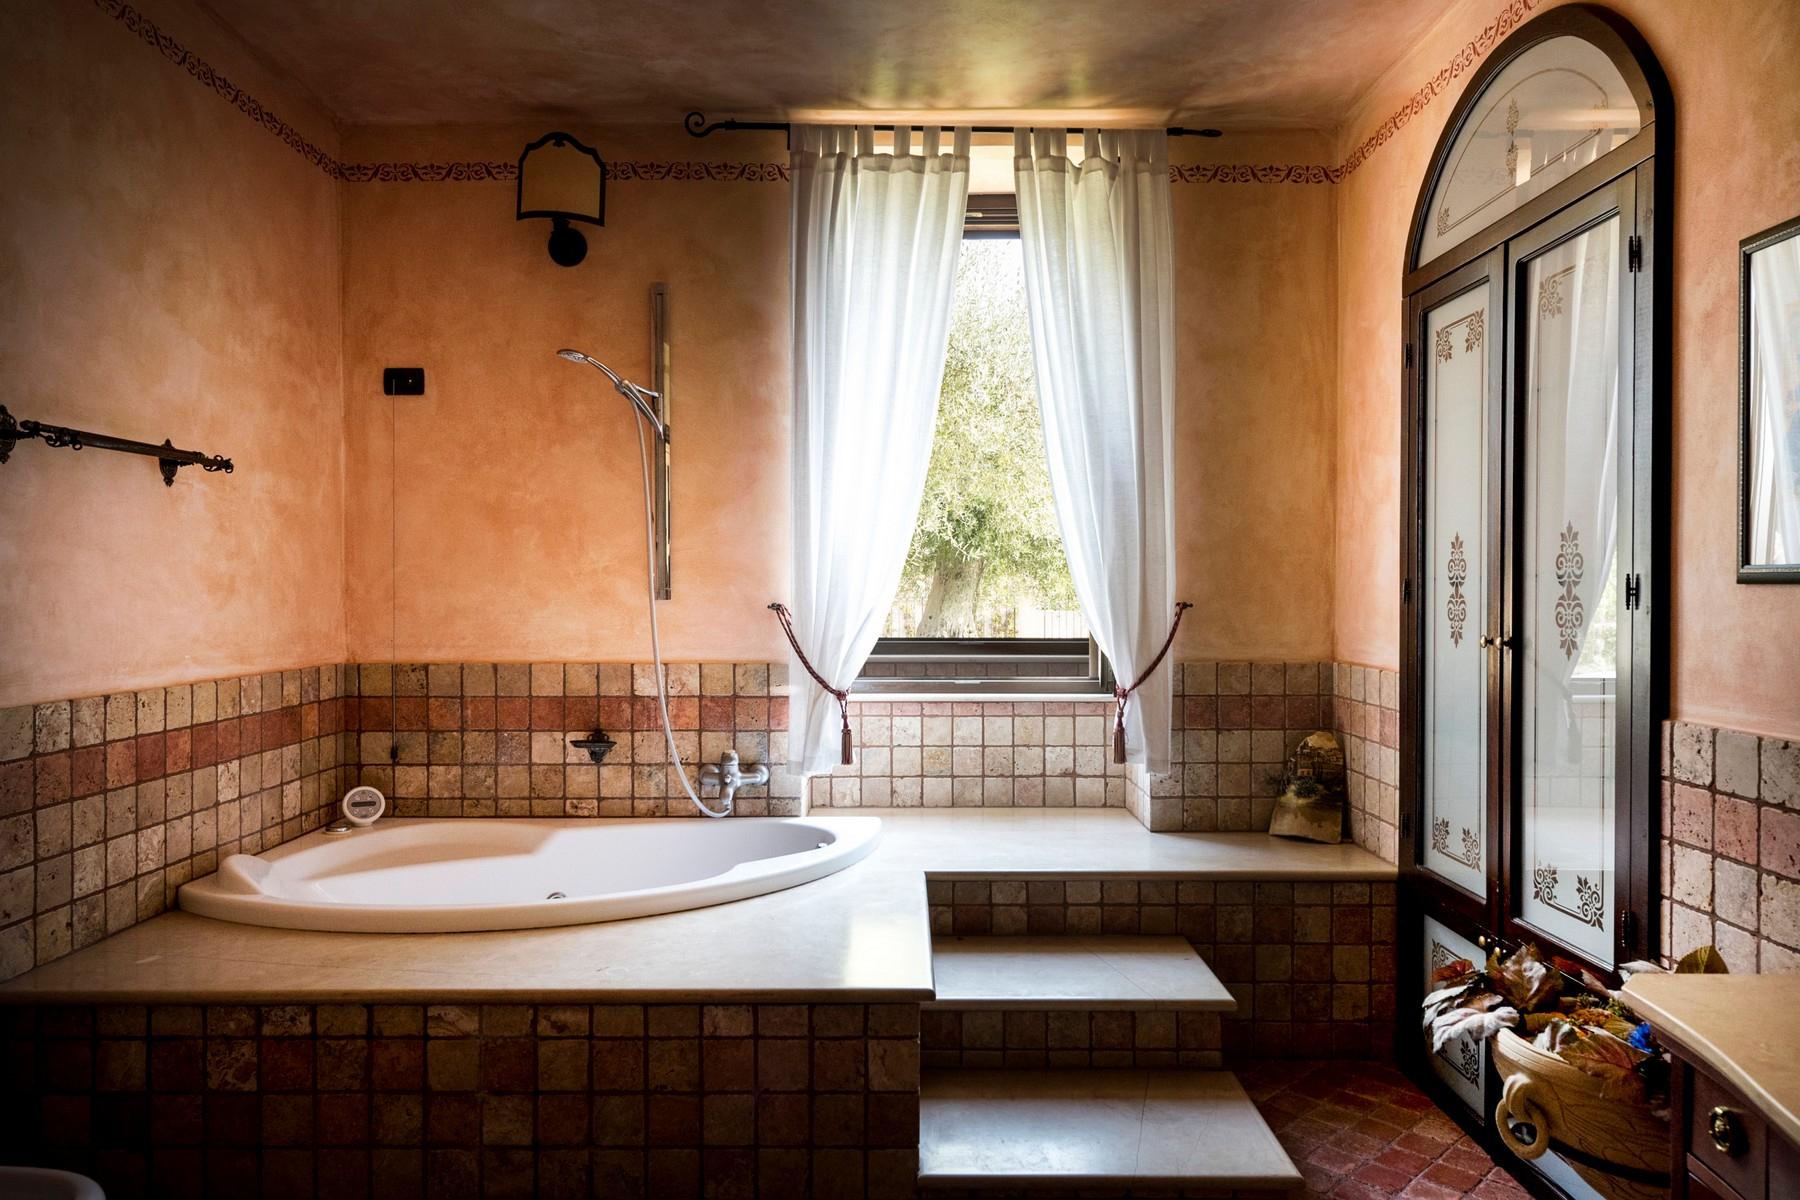 Casa indipendente in Vendita a Noto: 5 locali, 300 mq - Foto 18